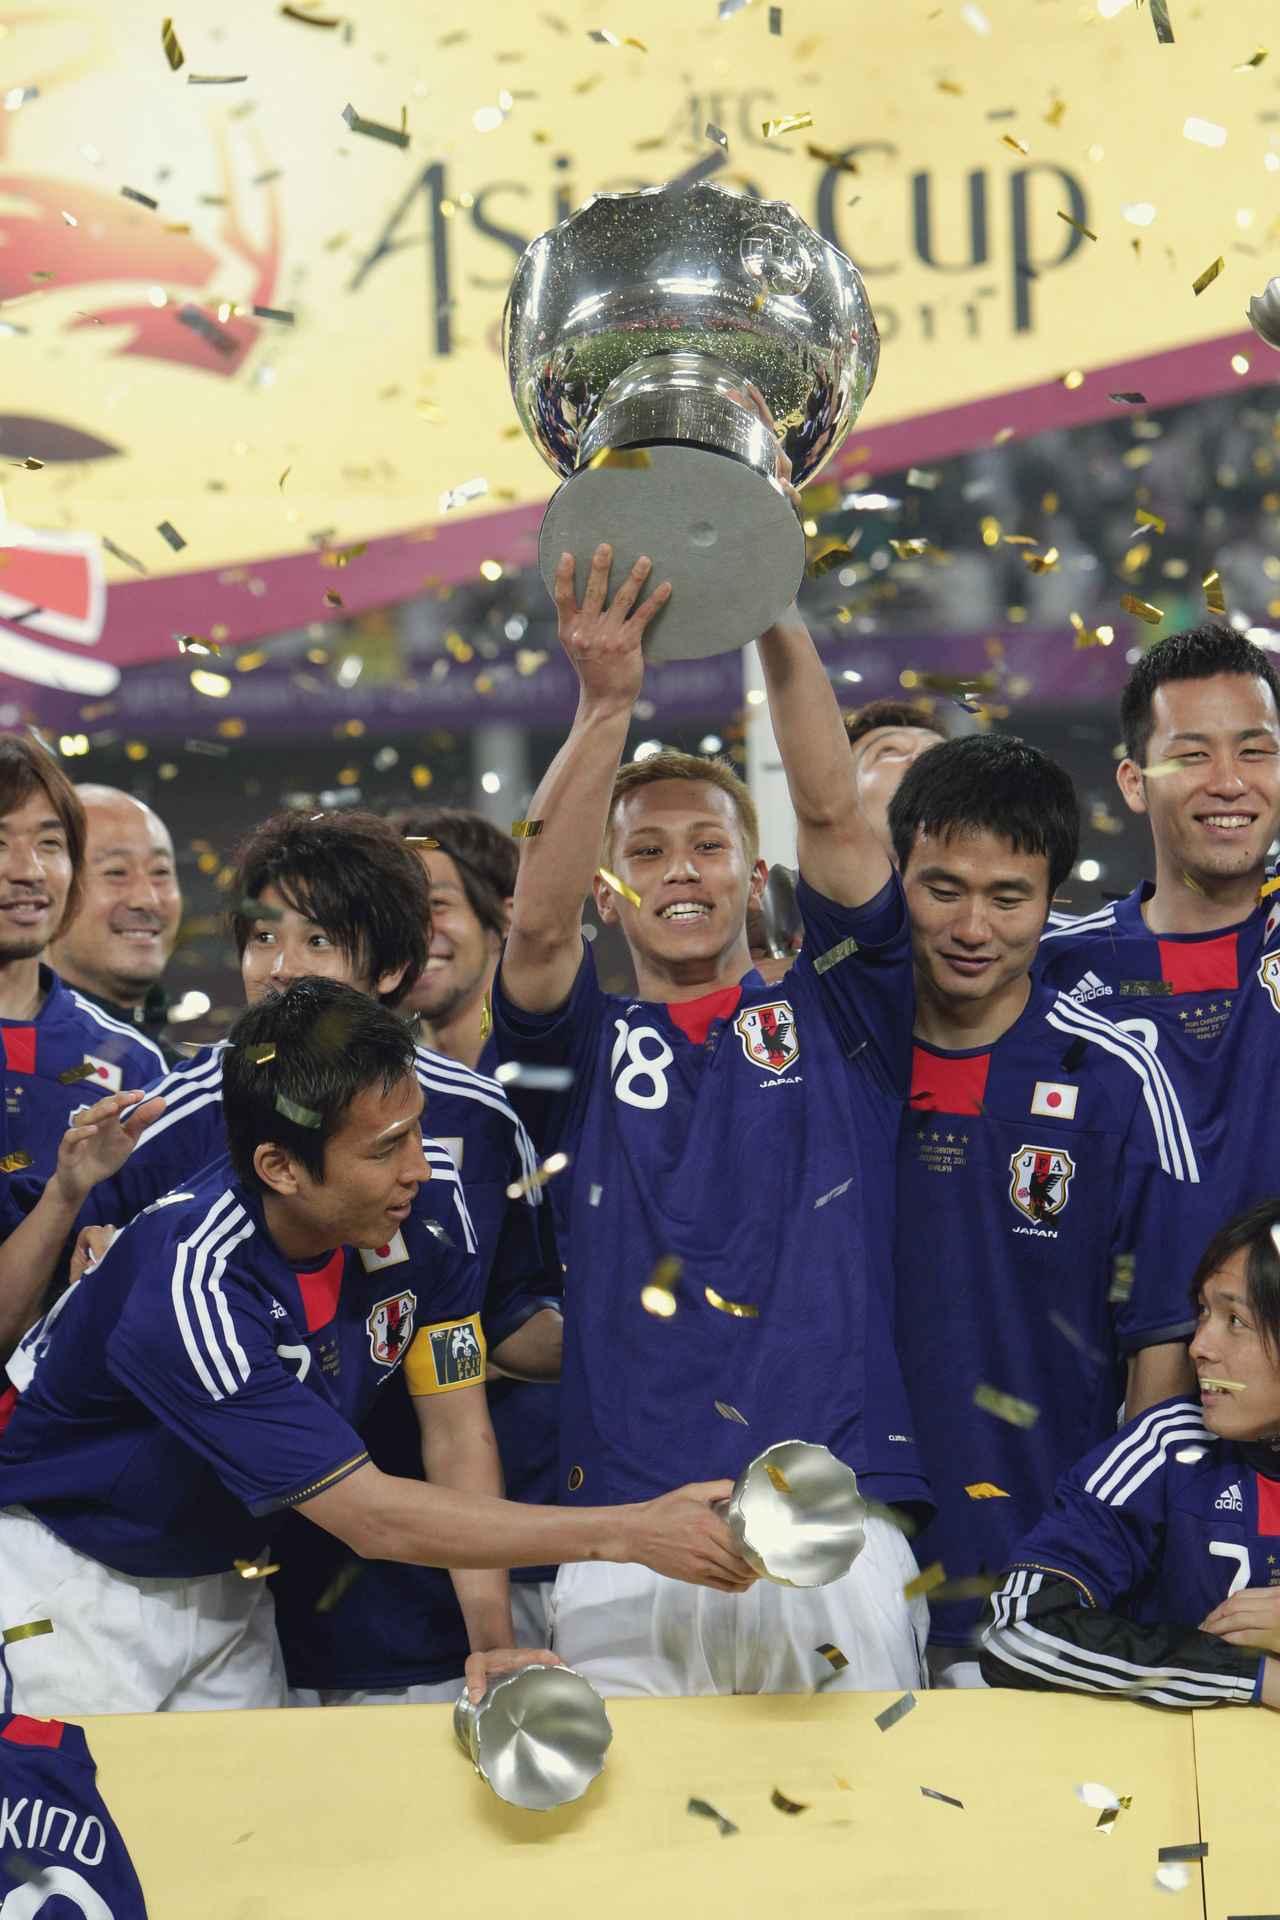 Images : 6番目の画像 - 幾多の苦闘を乗り越え、団結してアジア王座を奪還した日本(写真◎小山真司) - サッカーマガジンWEB